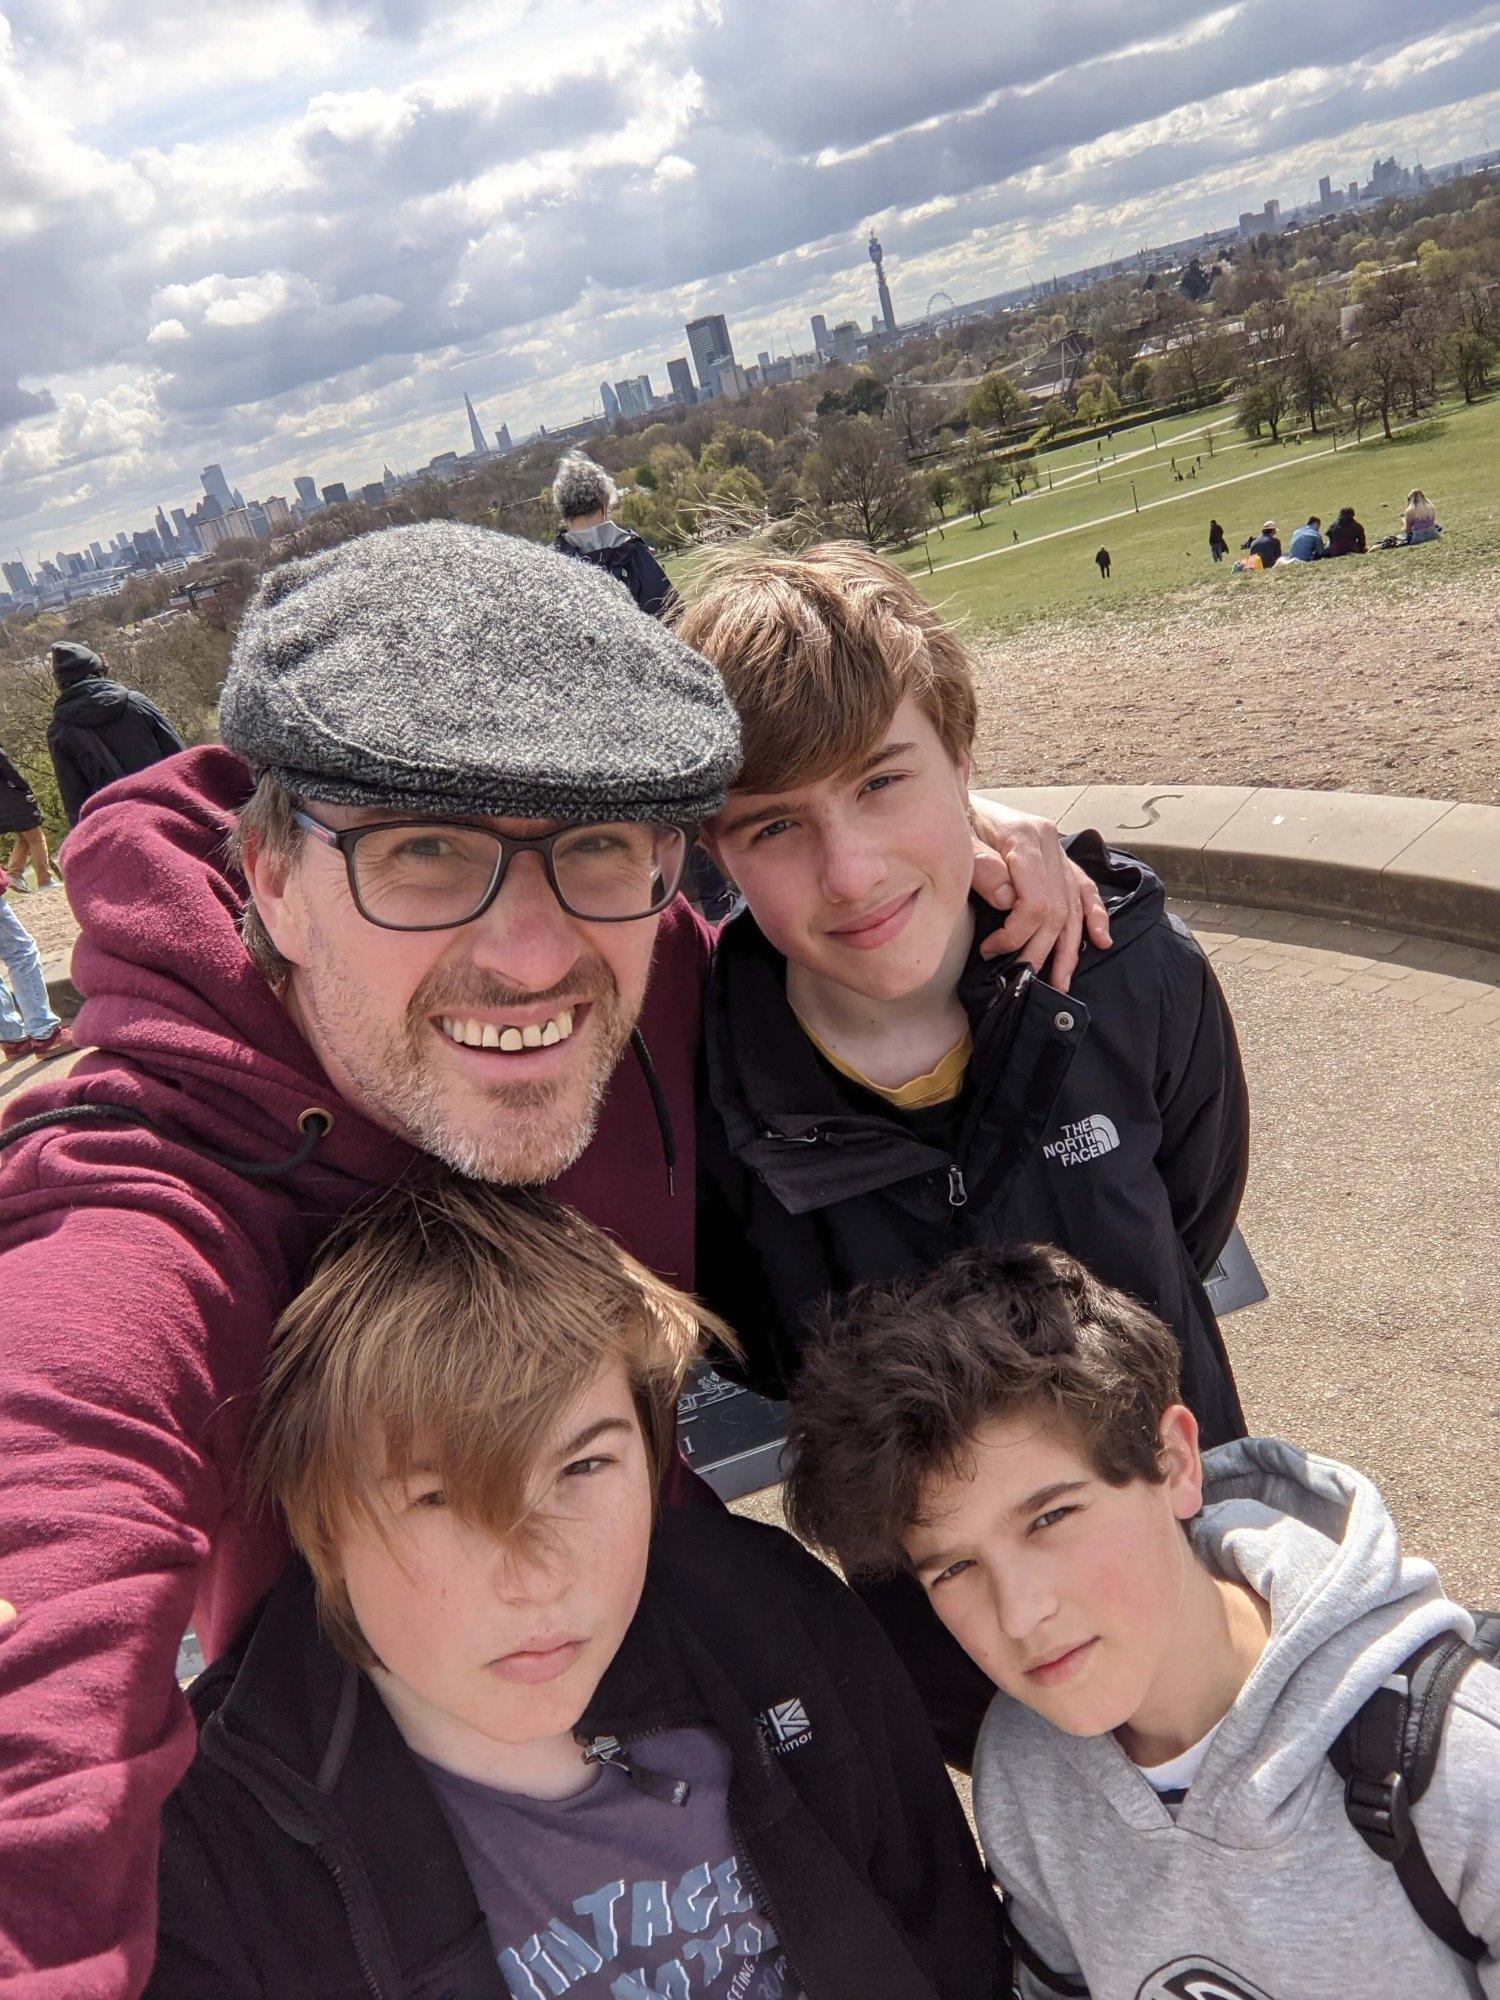 Family selfie on Primrose Hill in London